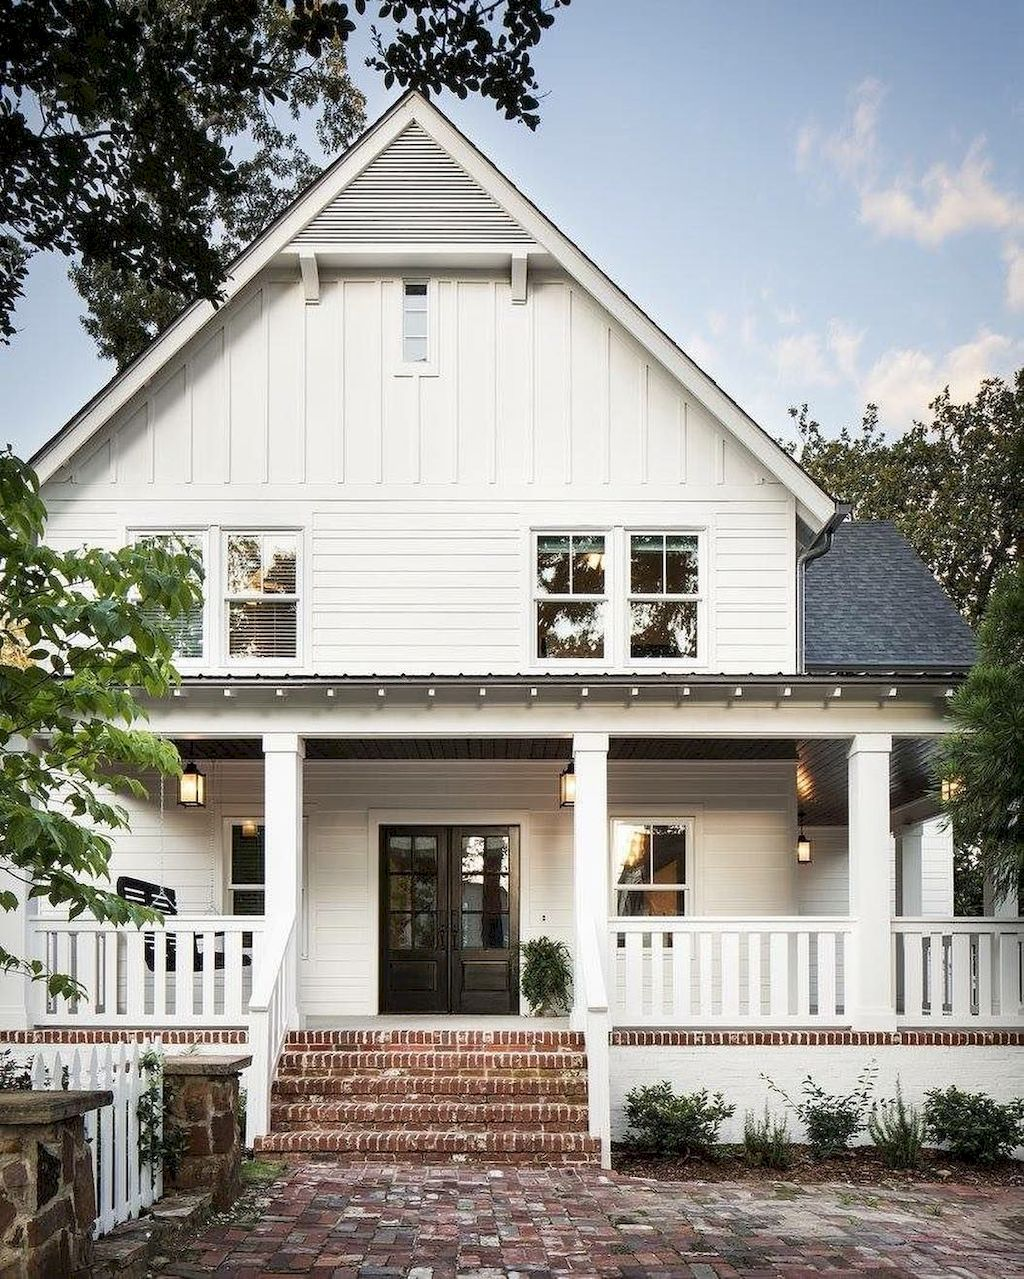 90 incredible modern farmhouse exterior design ideas farmhouse rh pinterest at